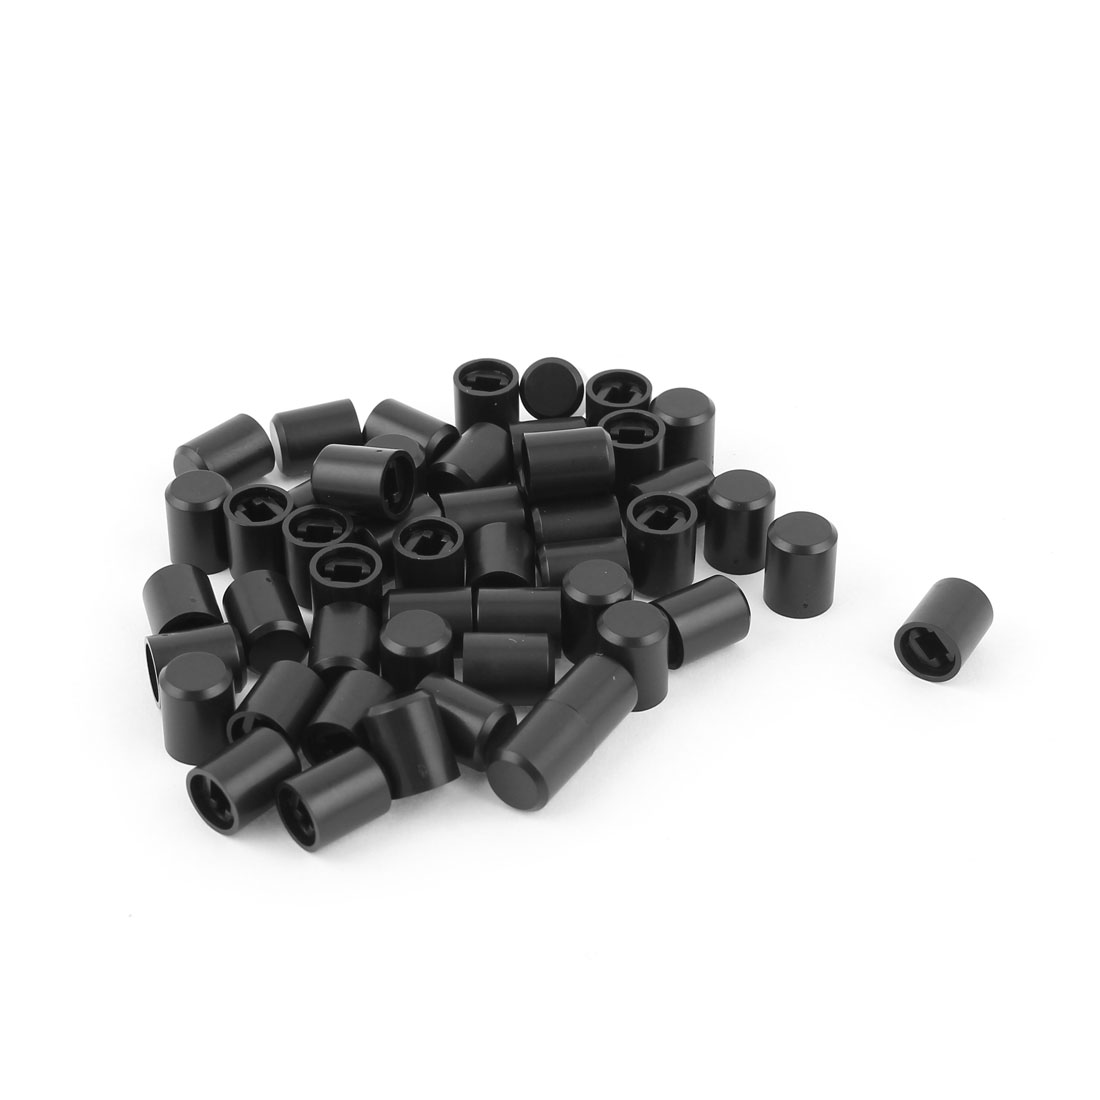 50pcs Household Black Plastic Range Hood Switch Cap Cover 8.3mmx10.5mm